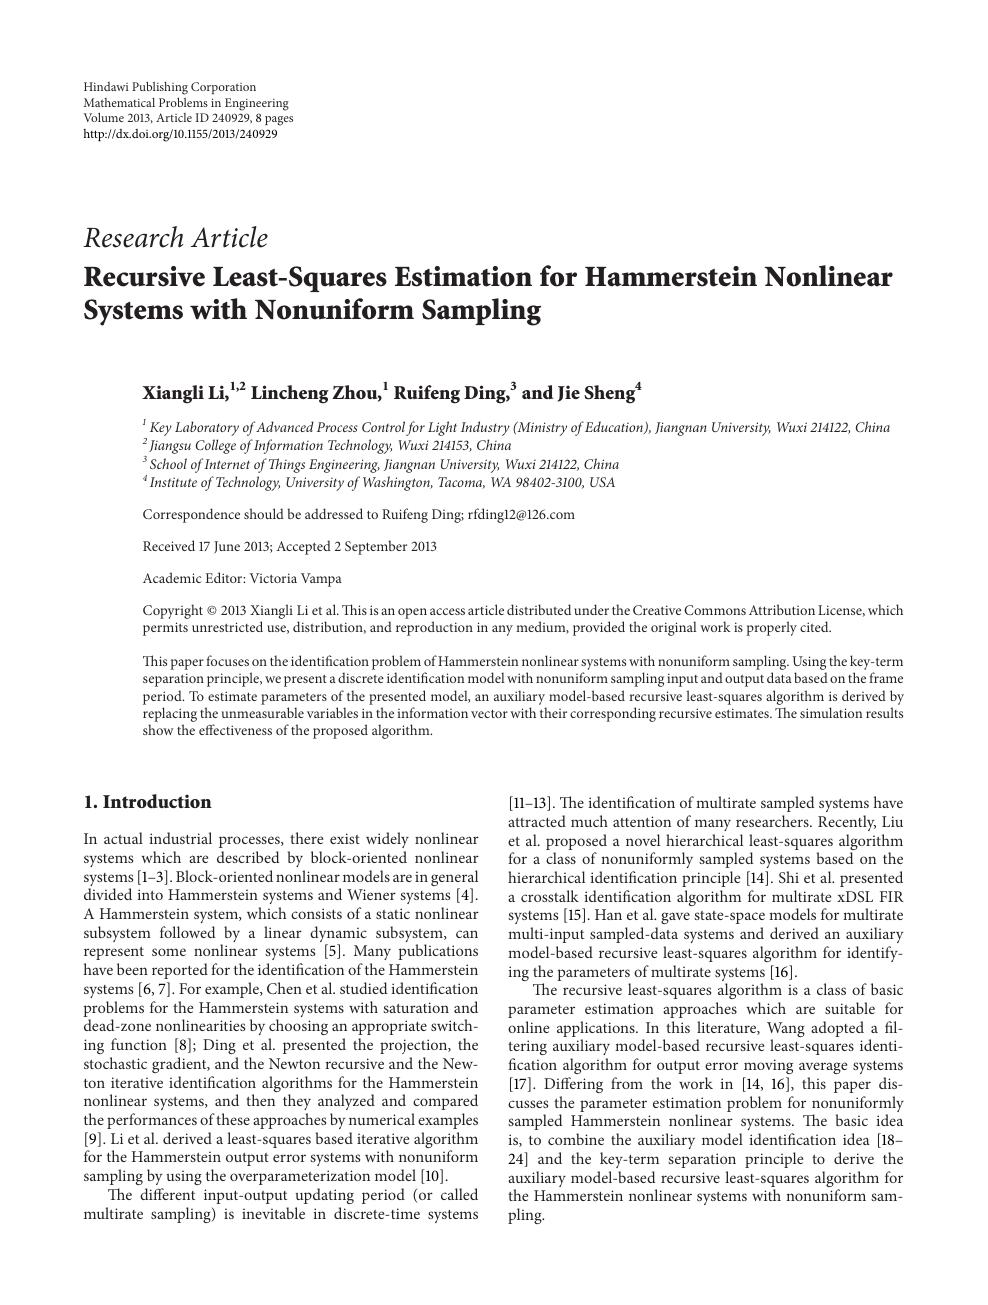 Recursive Least-Squares Estimation for Hammerstein Nonlinear